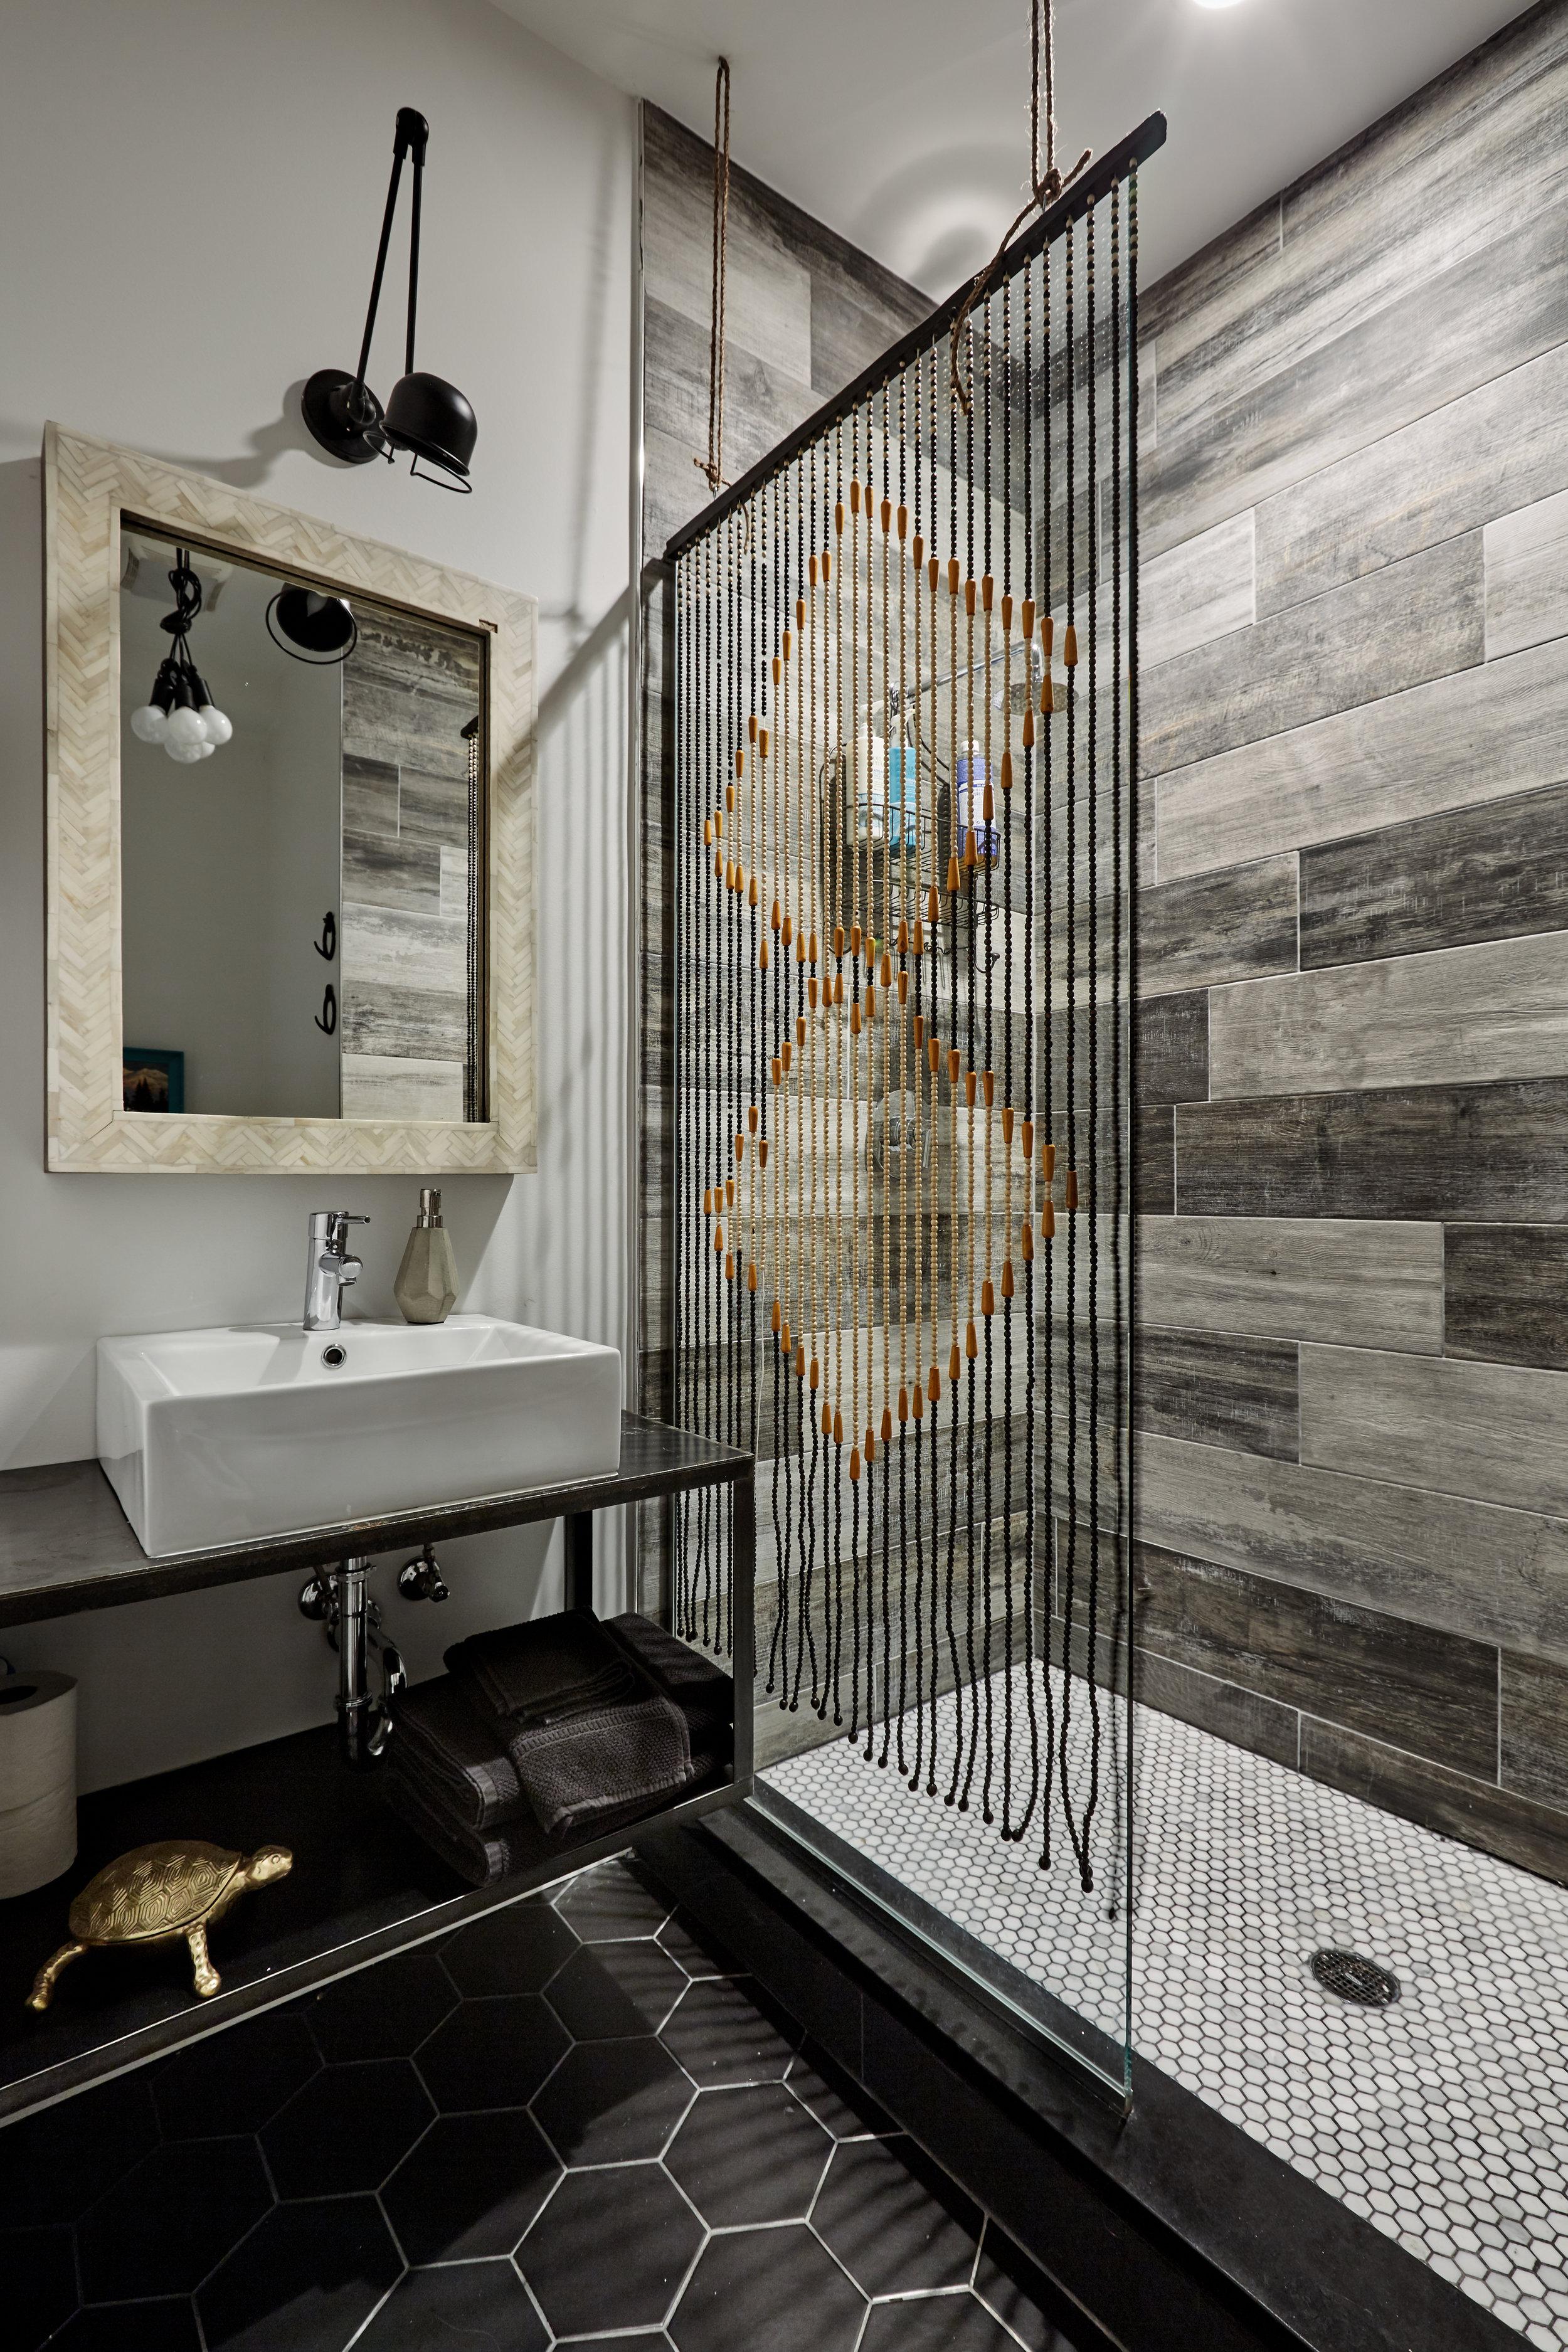 El_Motel_Bathroom_899.jpg